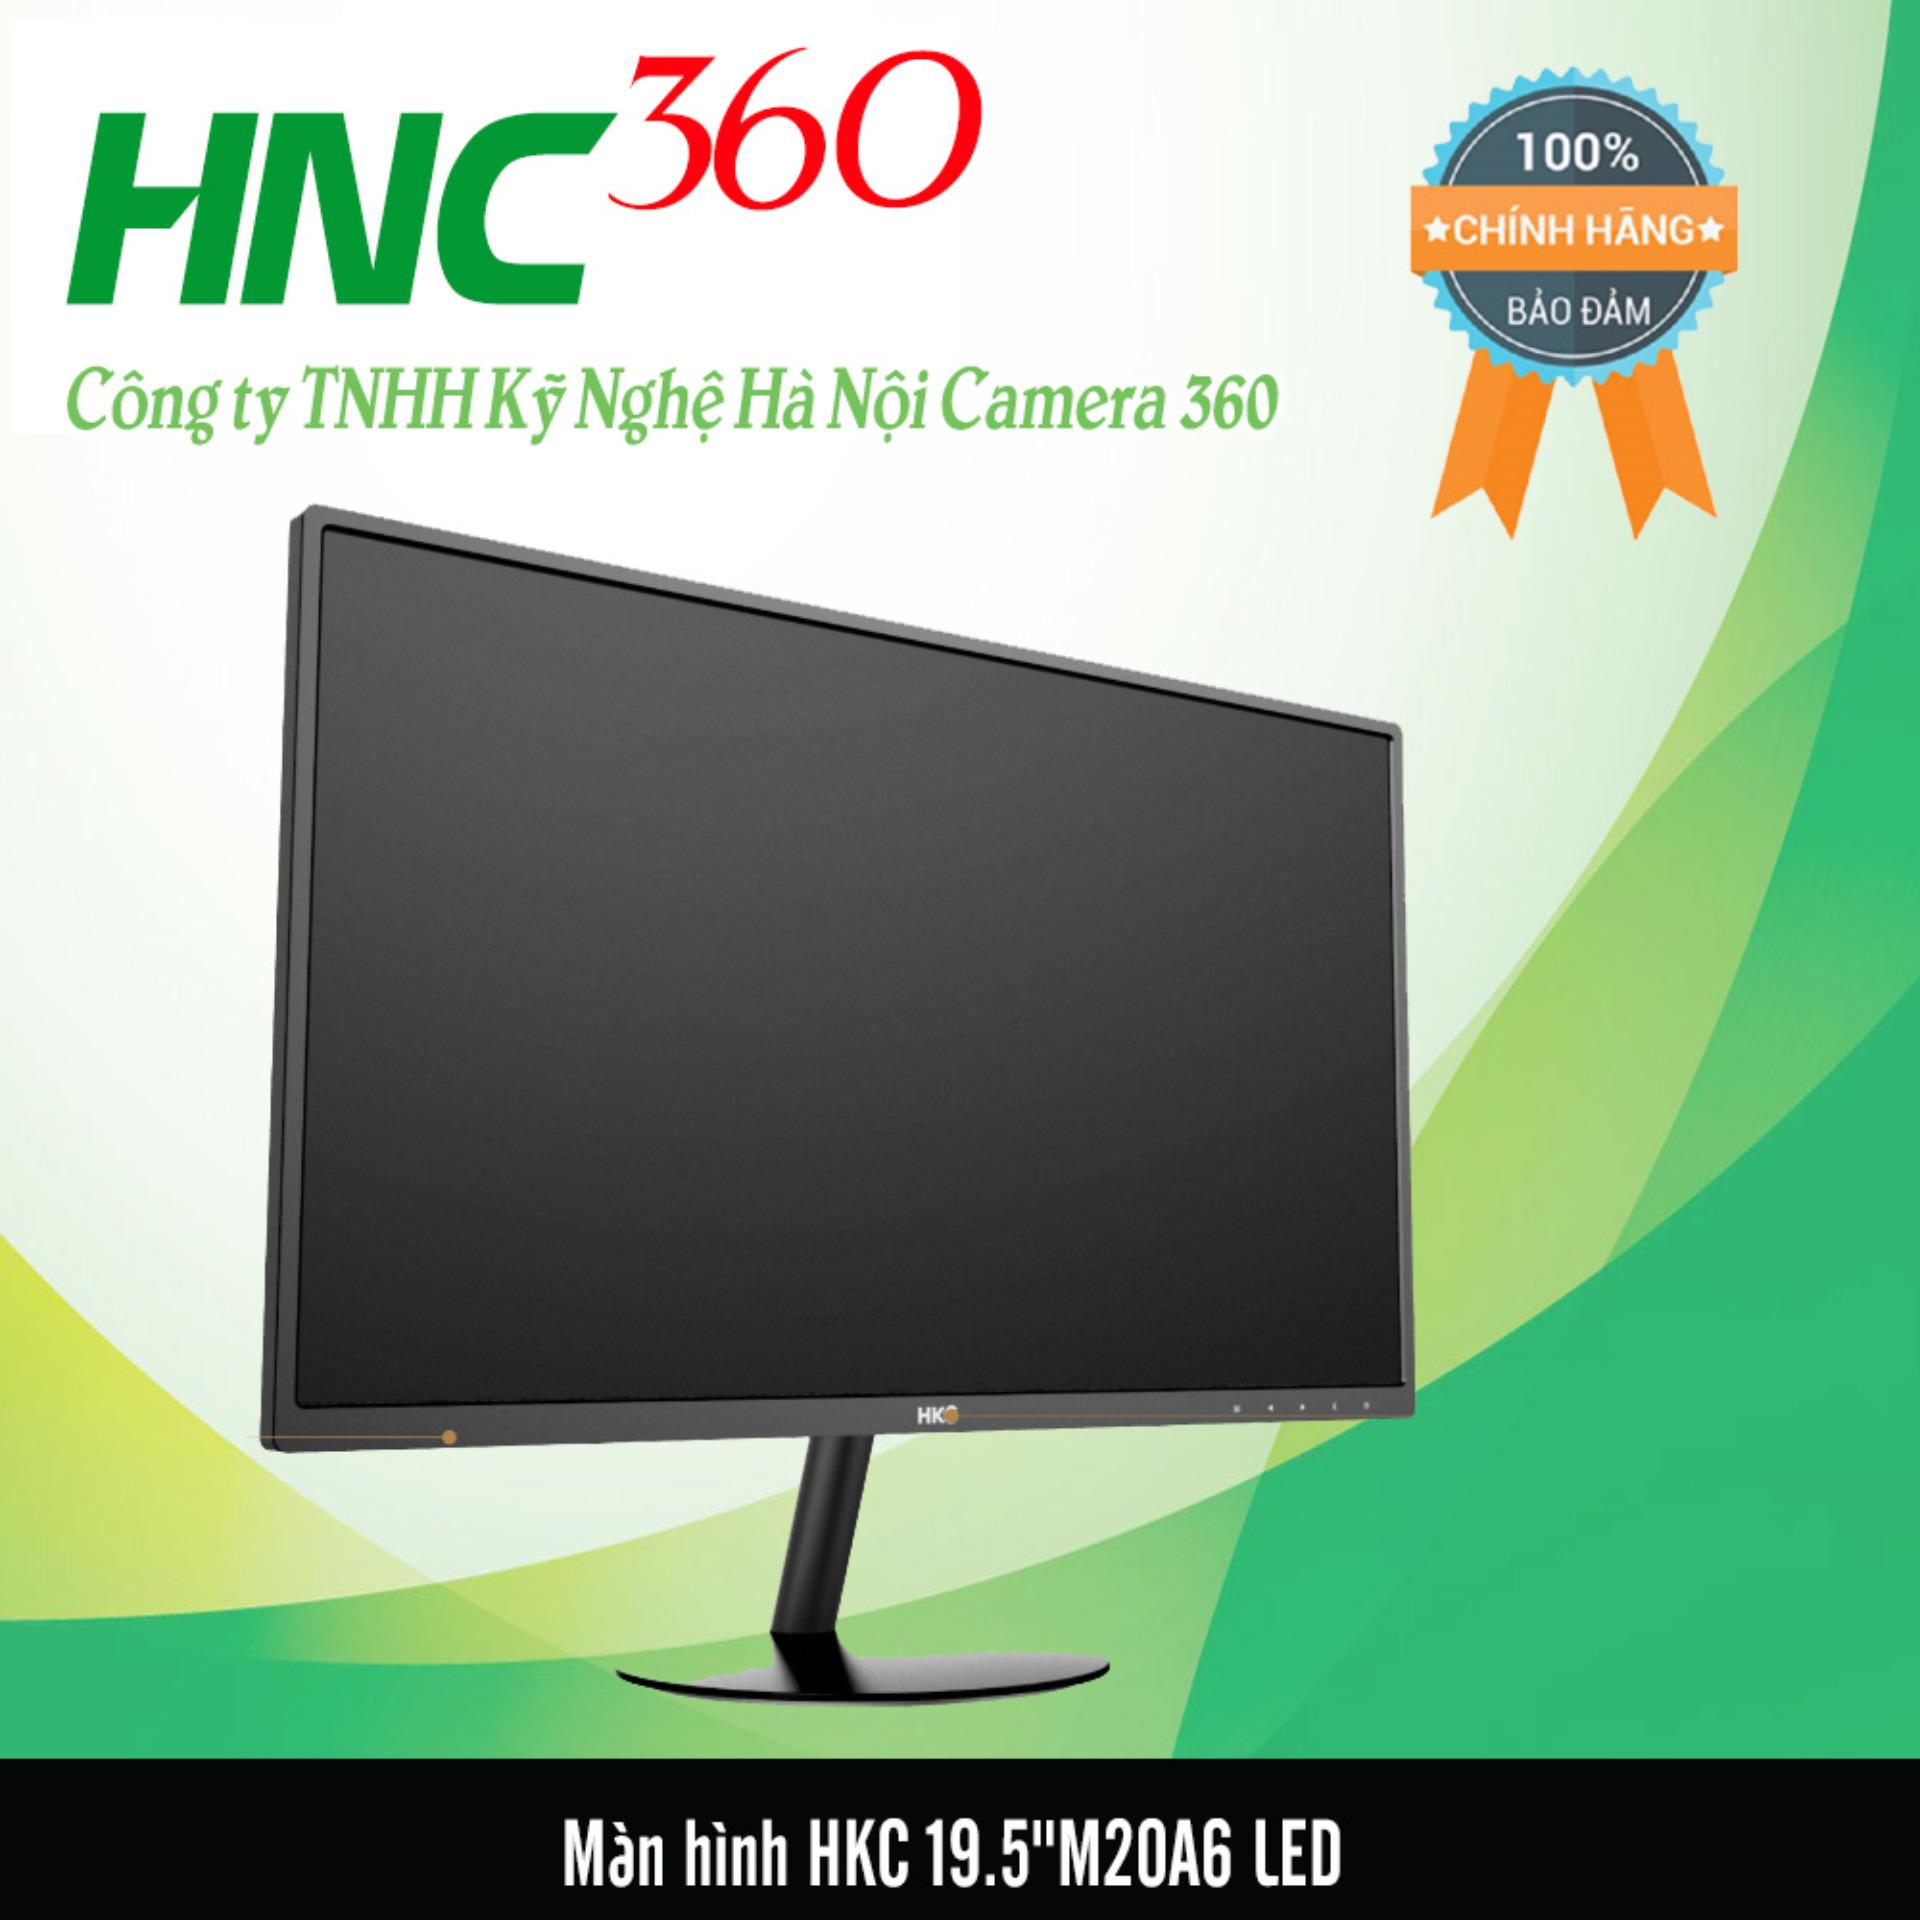 HKC M20A6 19.53Inch Full FHD wide LED